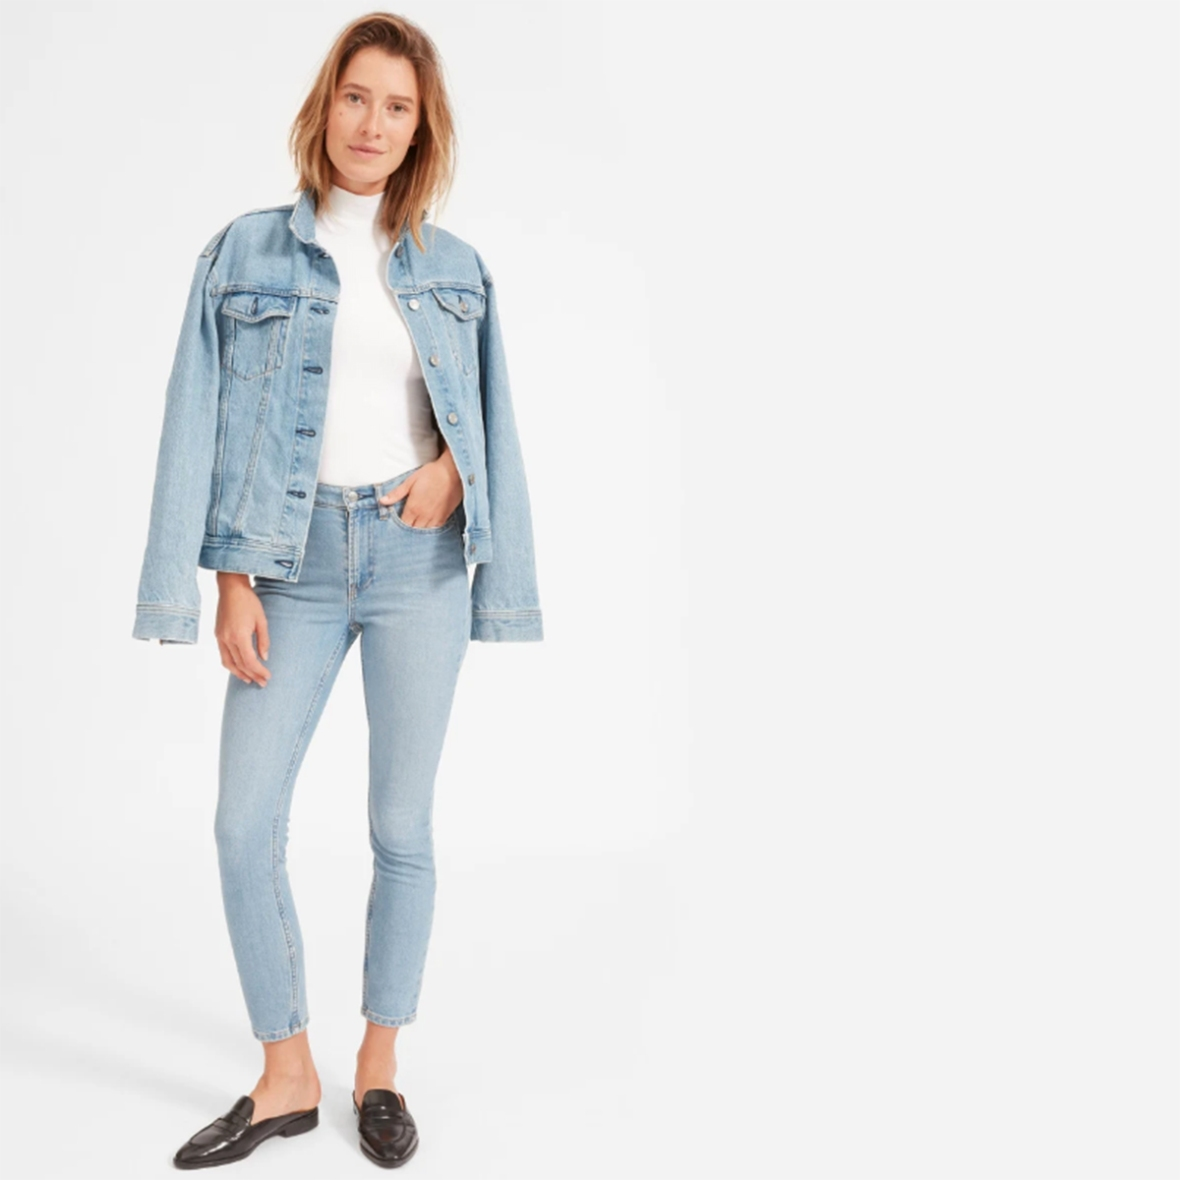 j-law-jeans